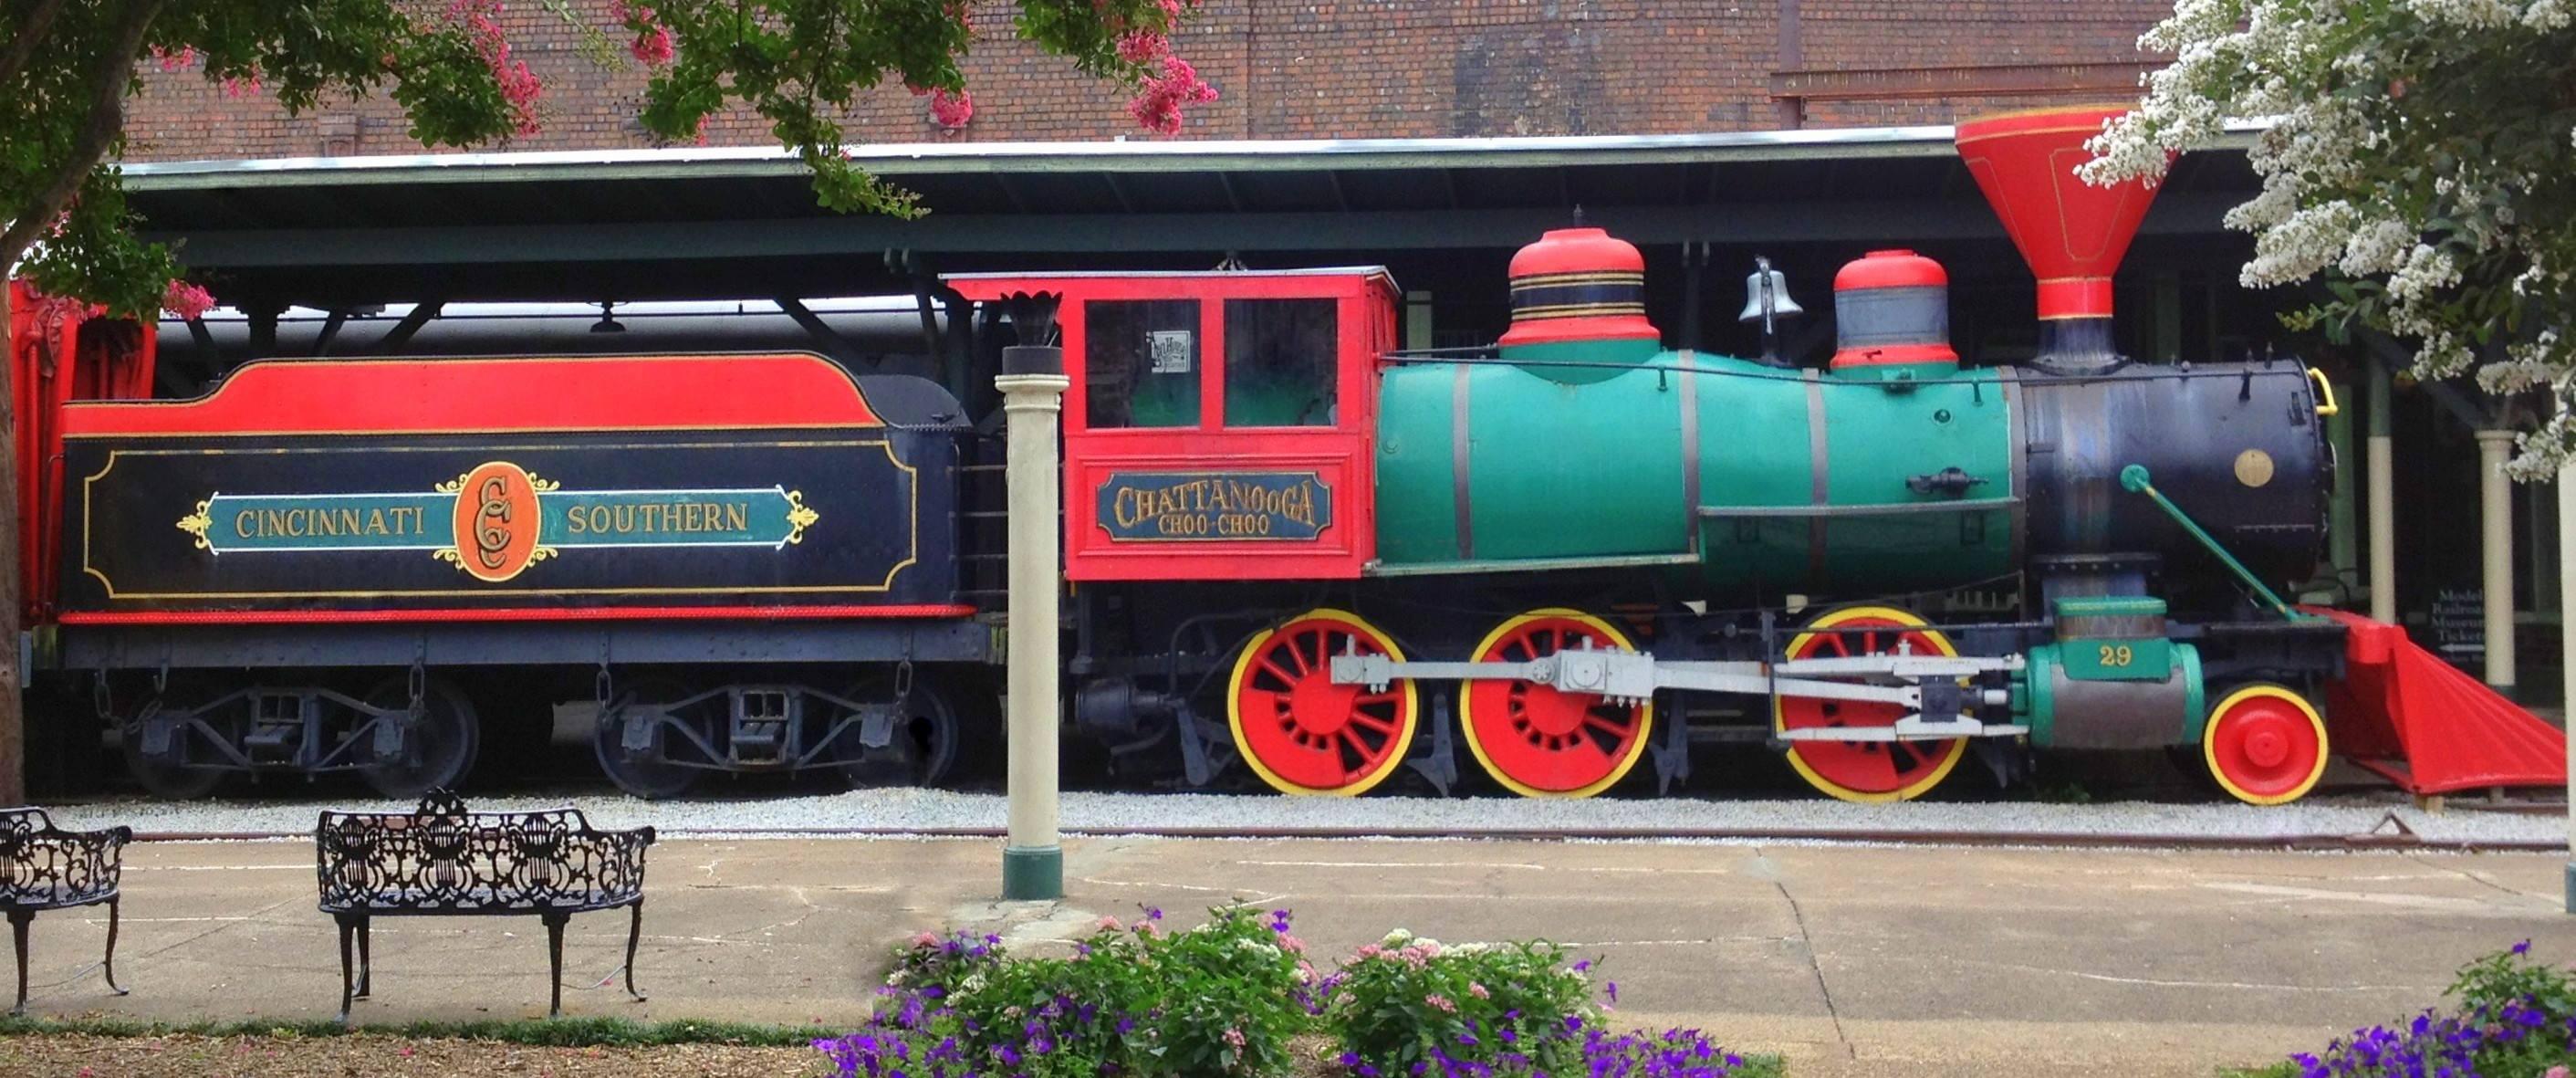 The Chattanooga Choo Choo Is The Best Train Themed